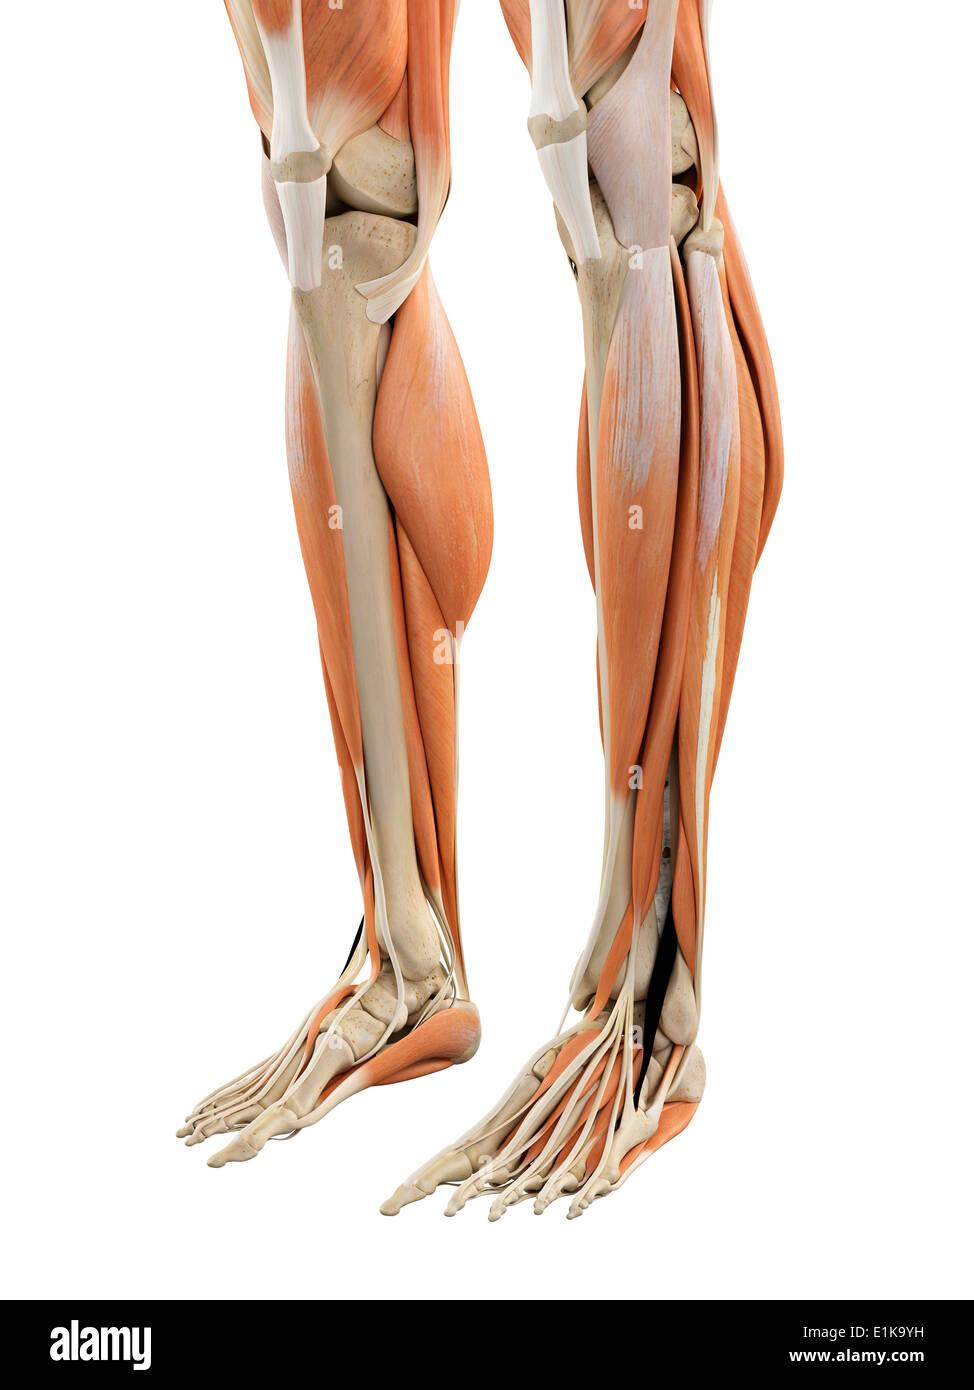 Human leg and foot anatomy computer artwork Stock Photo: 69881045 ...